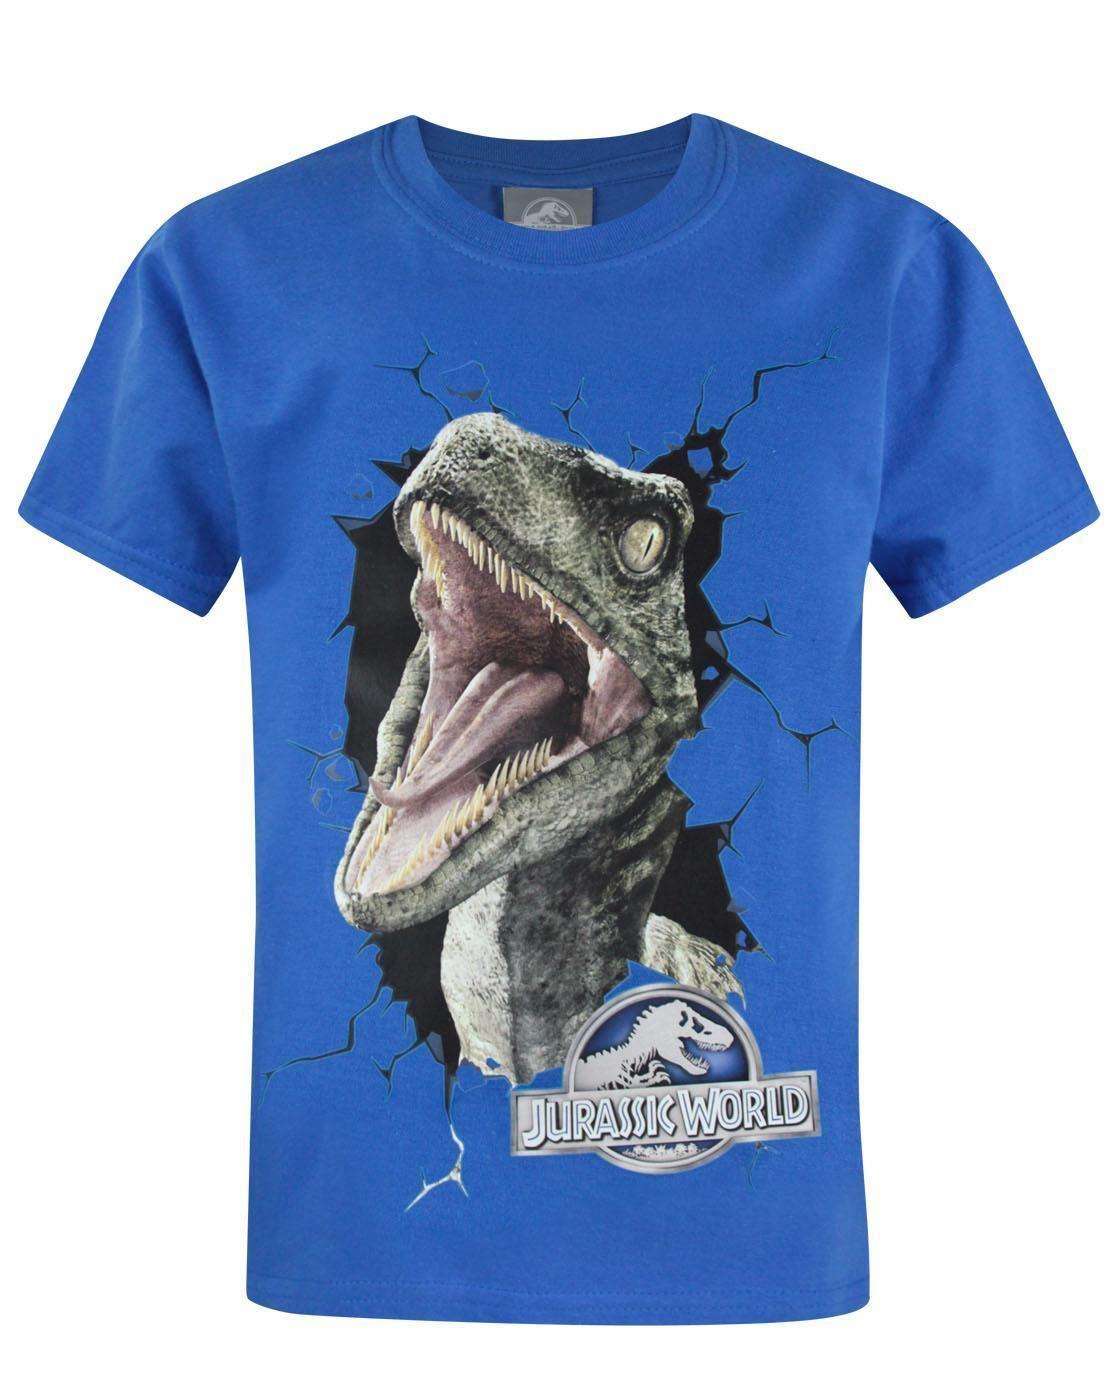 8dae6311 Official Jurassic World Raptor Kid'S T Shirt Brand Cotton Men Clothing Male  Slim Fit T Shirt Crazy T Shirts T Shirt Prints From Shitan8, $11.78|  DHgate.Com